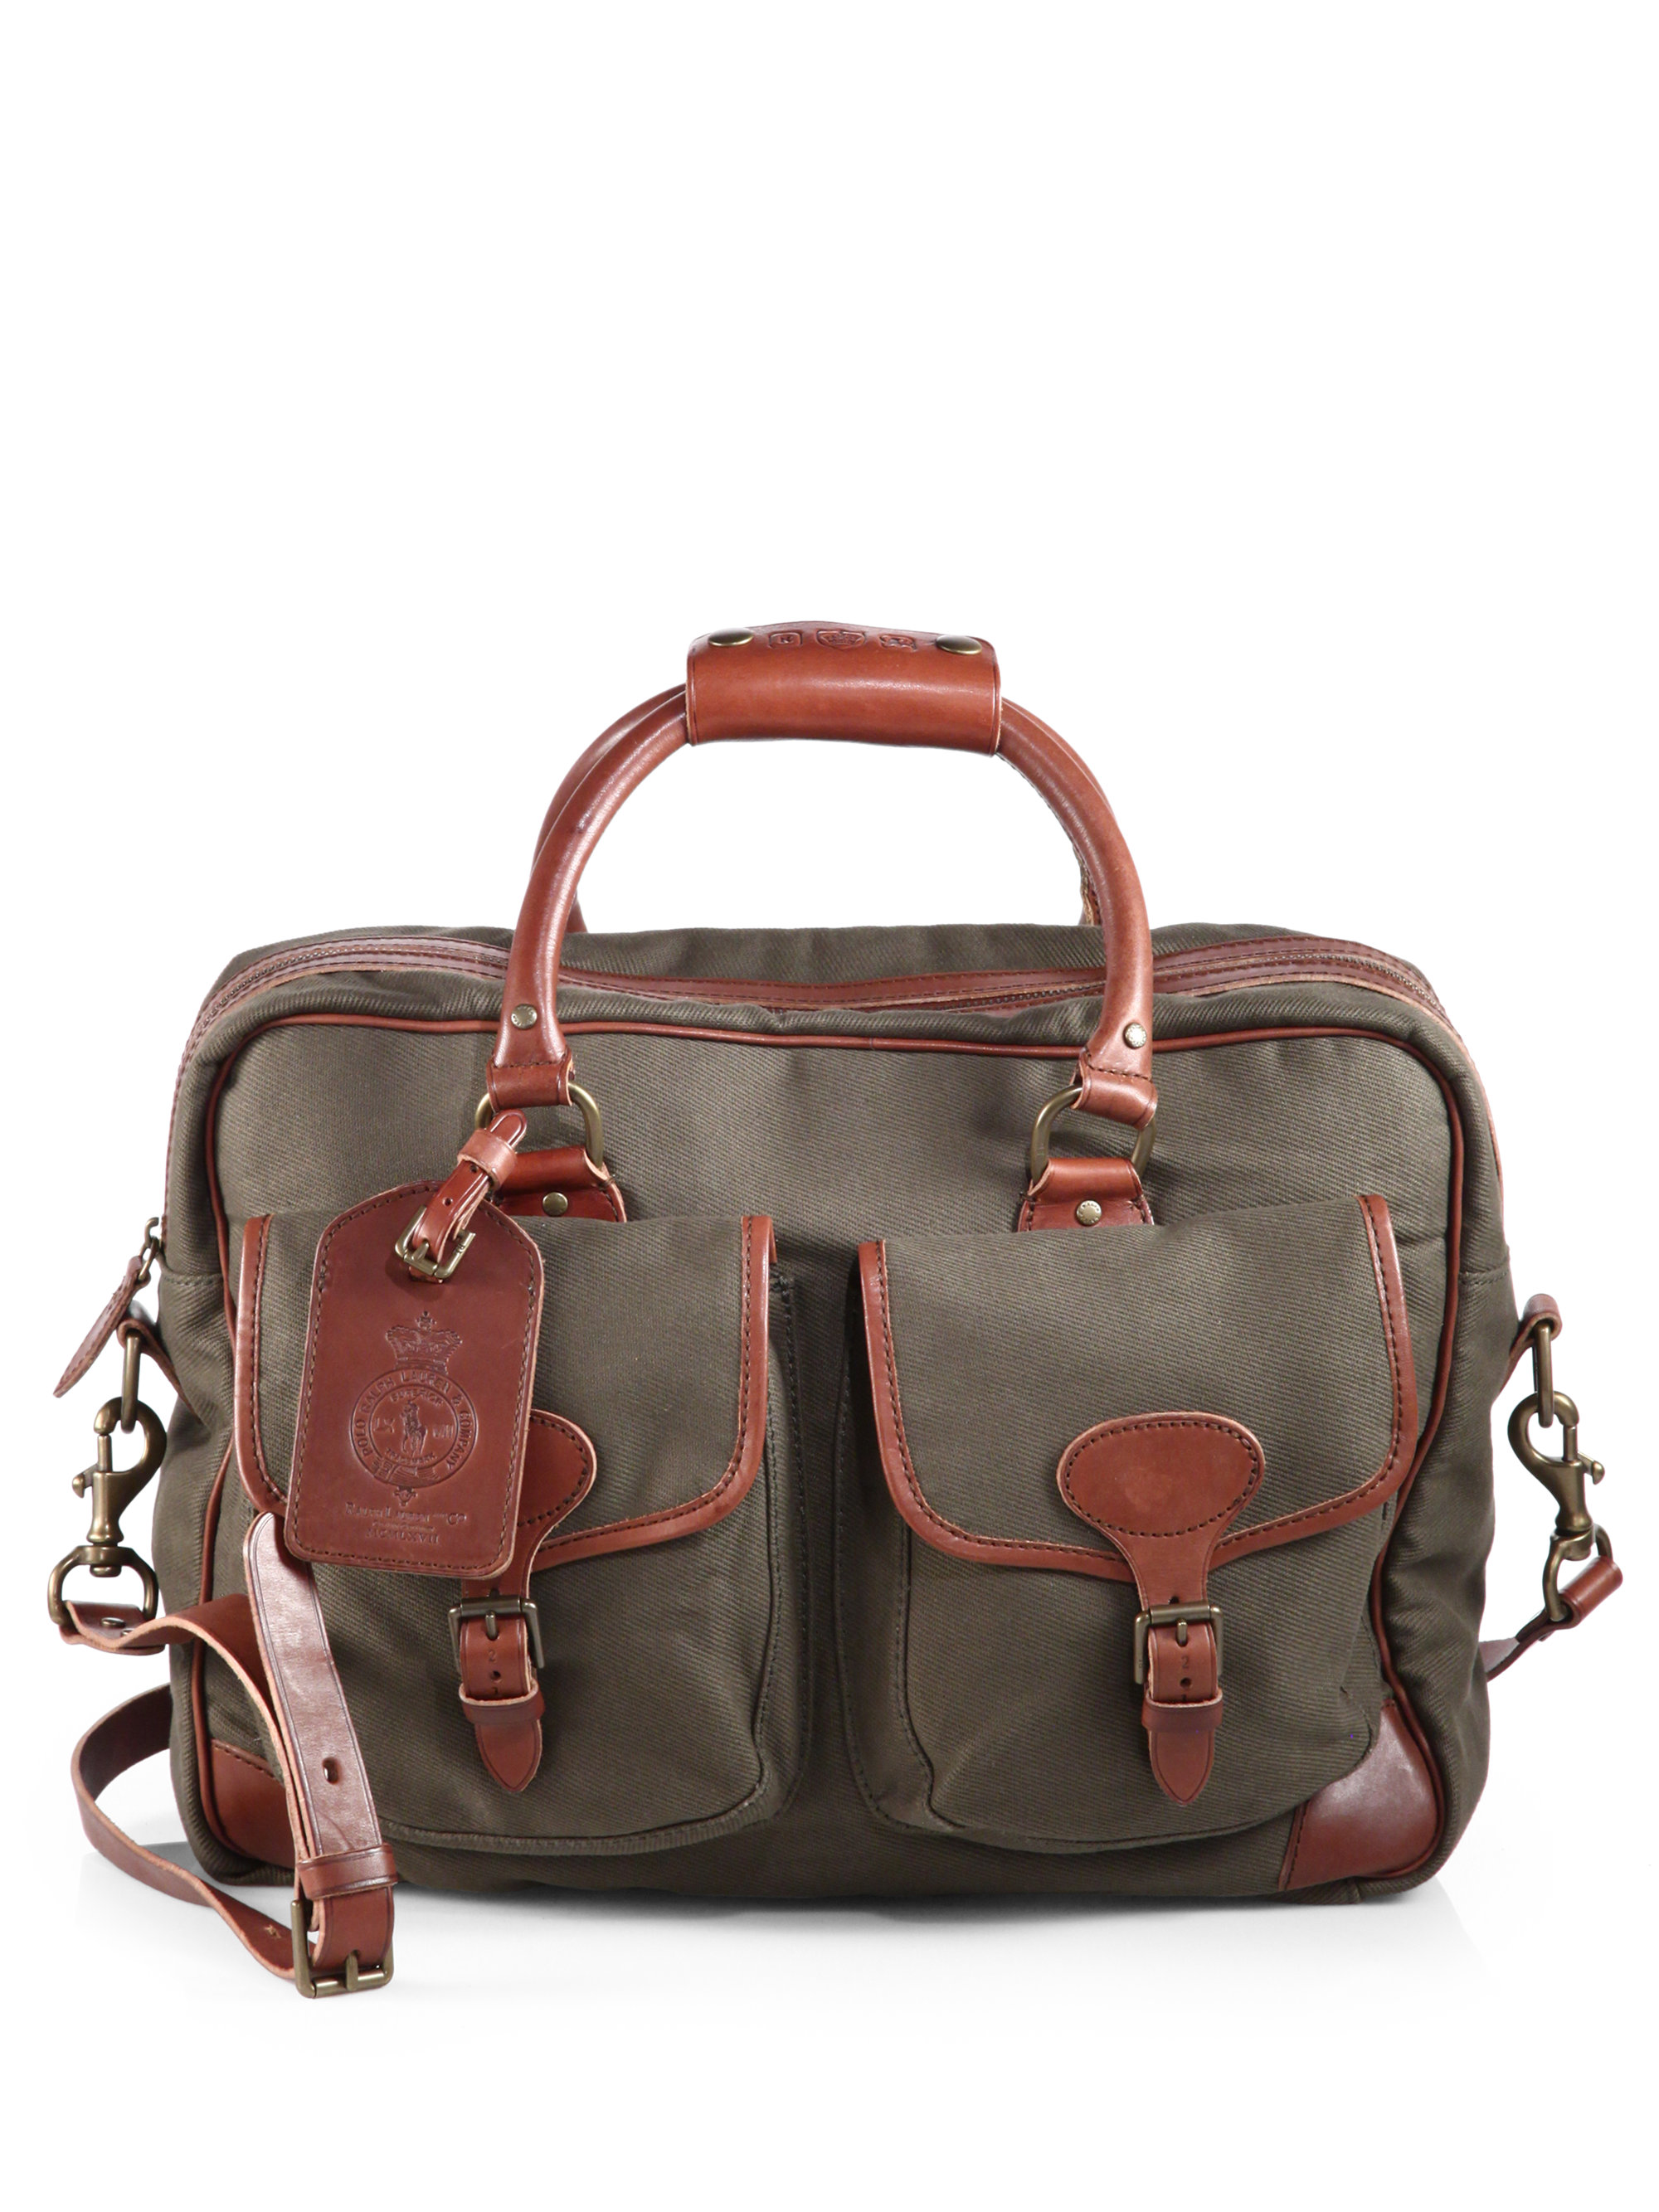 11c8374965e ... nylon duffel bag upcitemdb a21a8 c87a1  new style polo ralph lauren  yosemite messenger c0060 f99d8